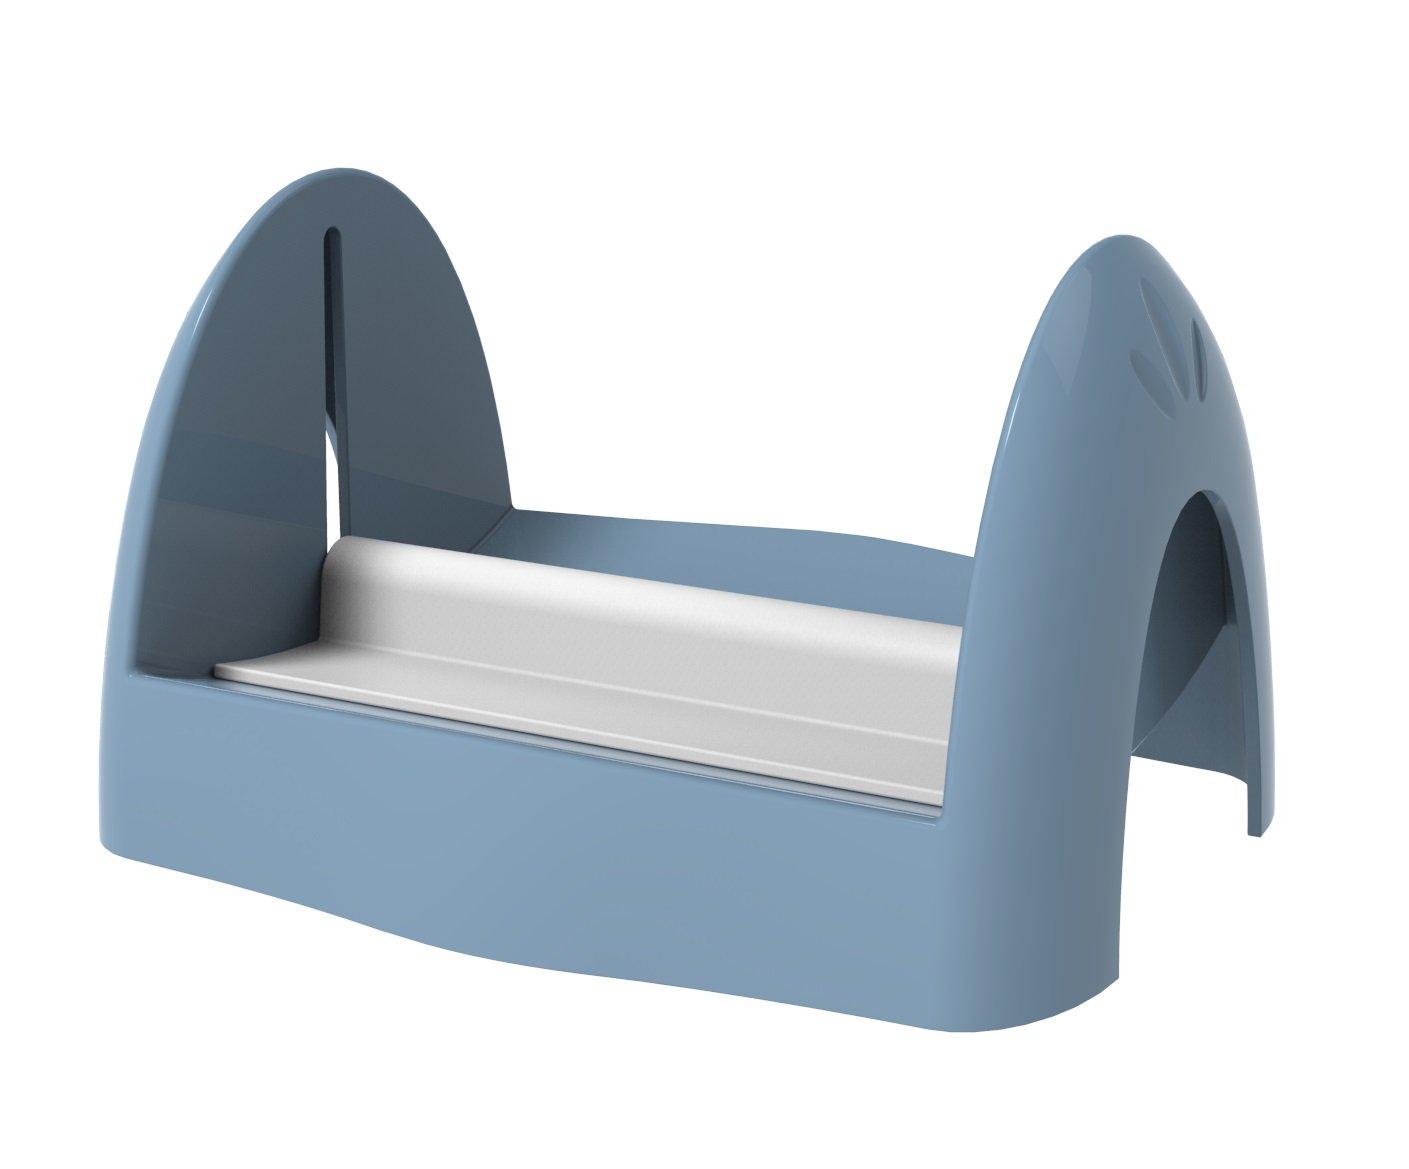 biesse Pin-Up Portatovaglioli con Pressino, Azzurro, 22 x 18 x 13 cm Ecoplast P 605/34